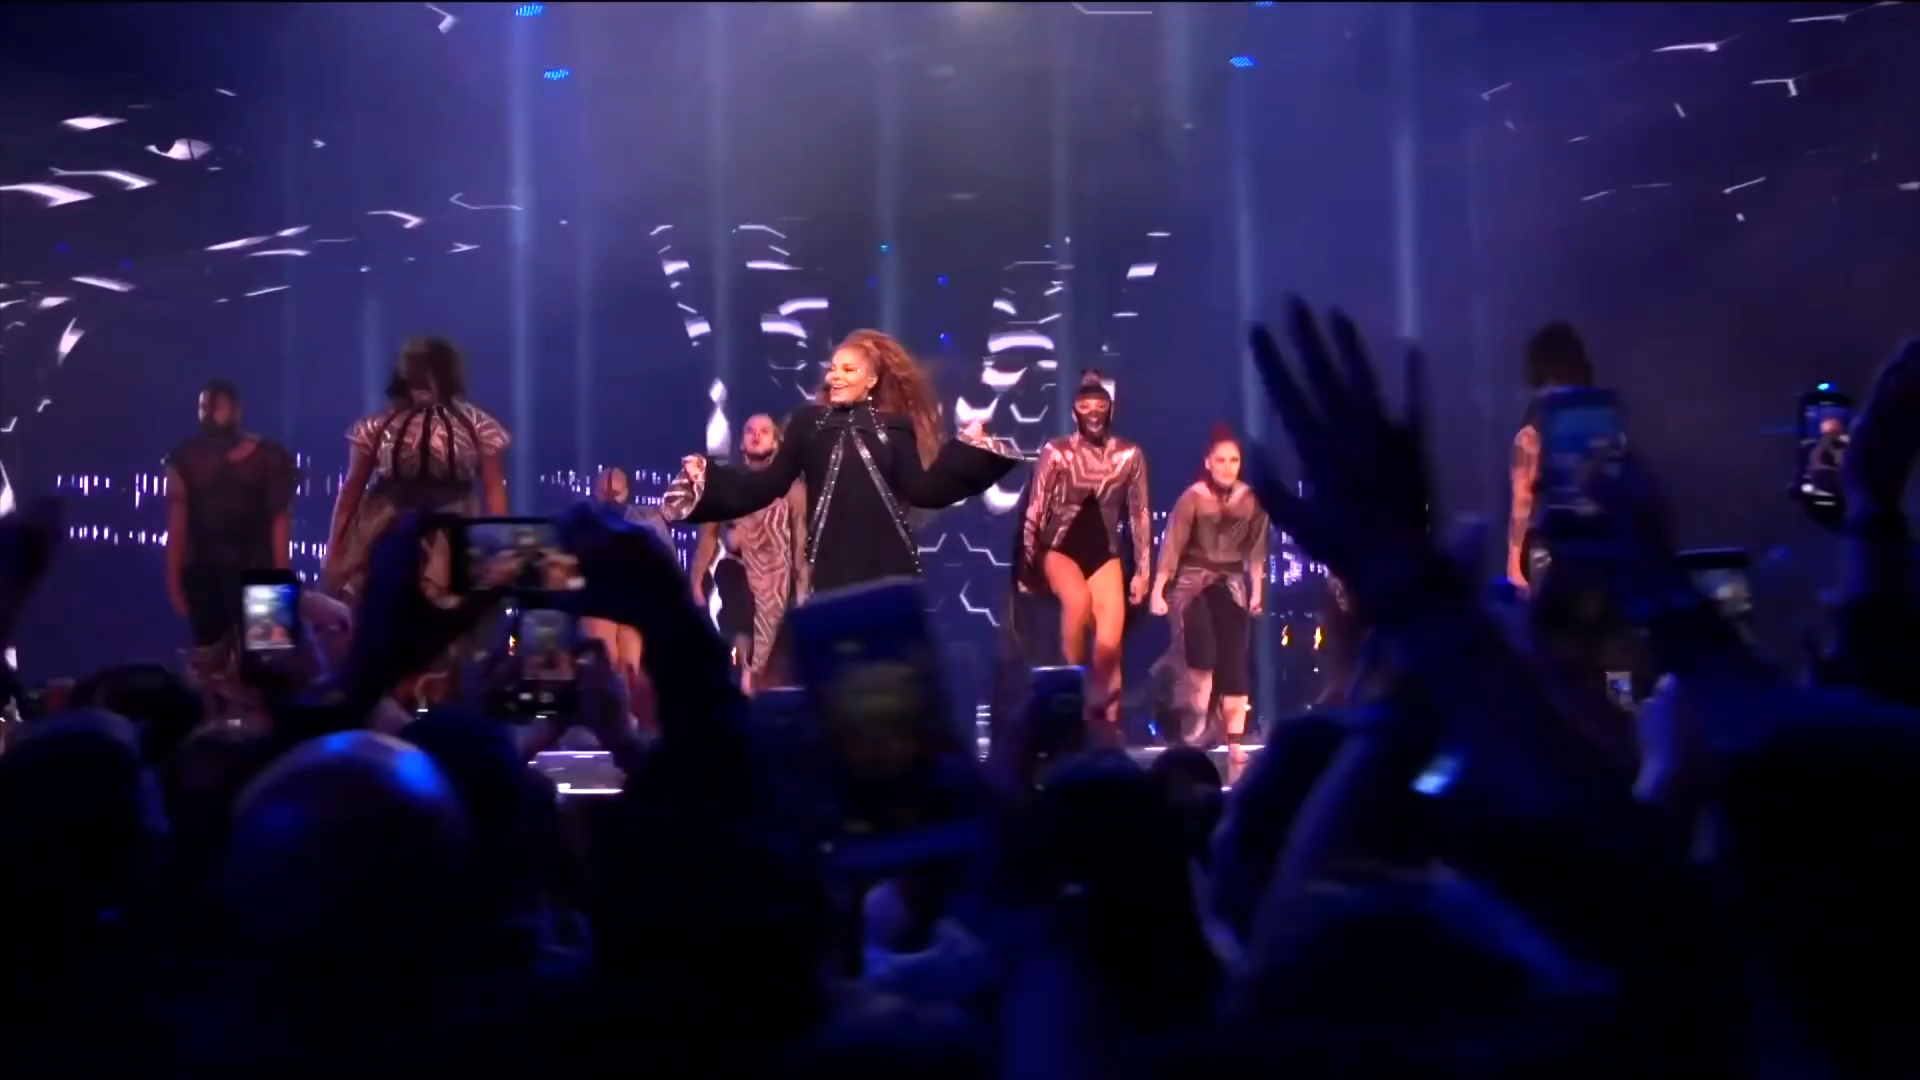 Janet Jackson -  Made For Now   Rhythm Nation   All For You  Live   MTV EMAs 2018 (0-04-14-00).jpg